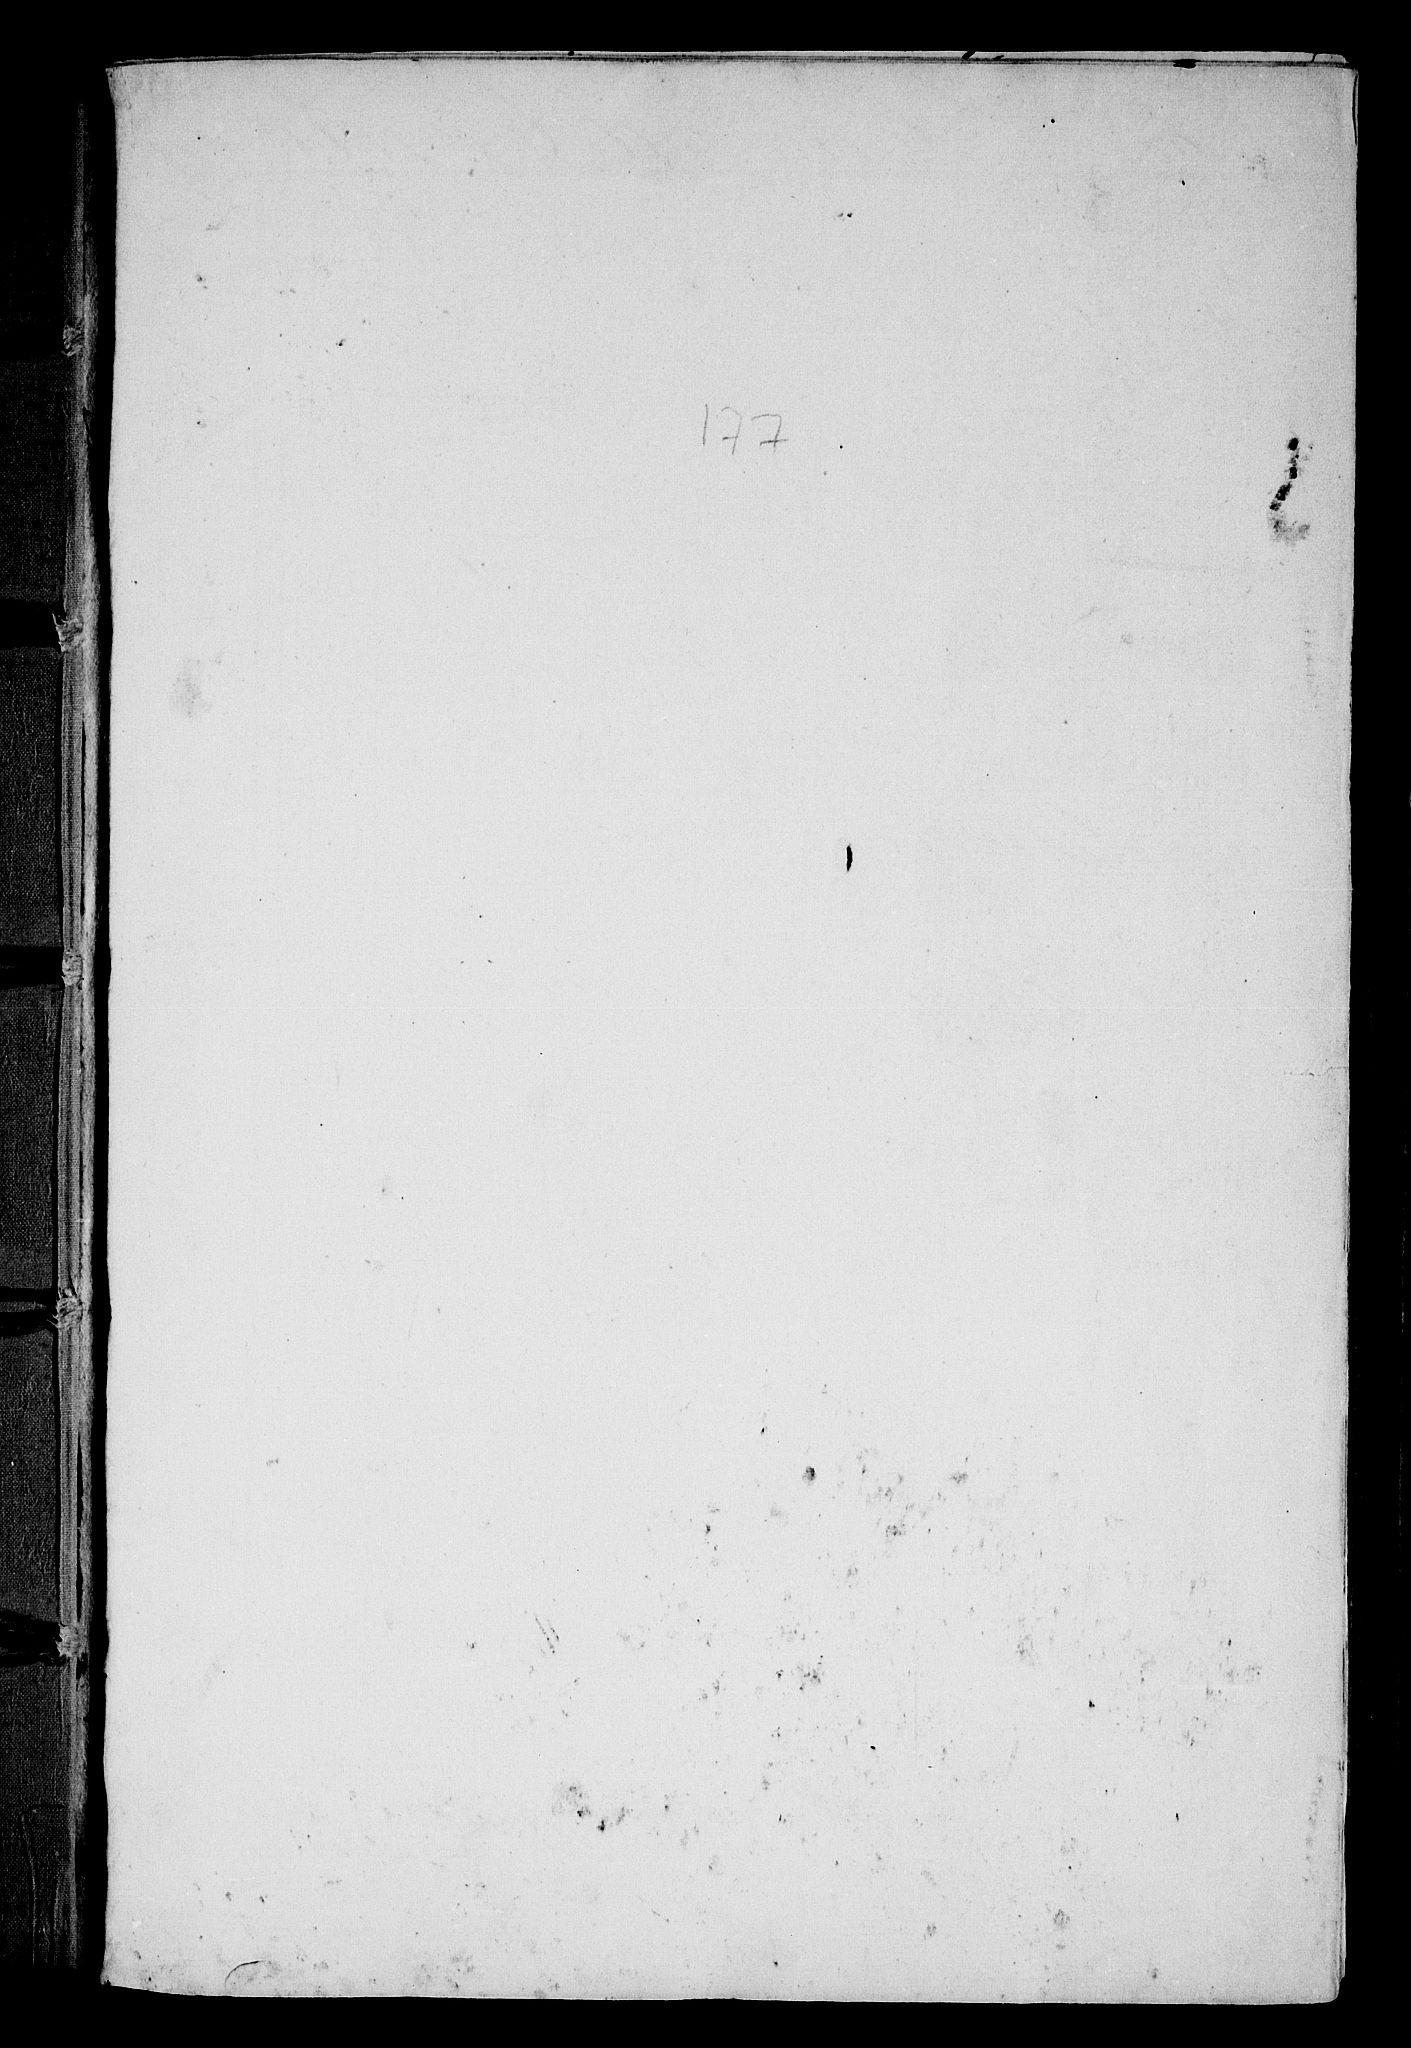 RA, Modums Blaafarveværk, G/Gd/Gda/L0177, 1845-1847, s. 2